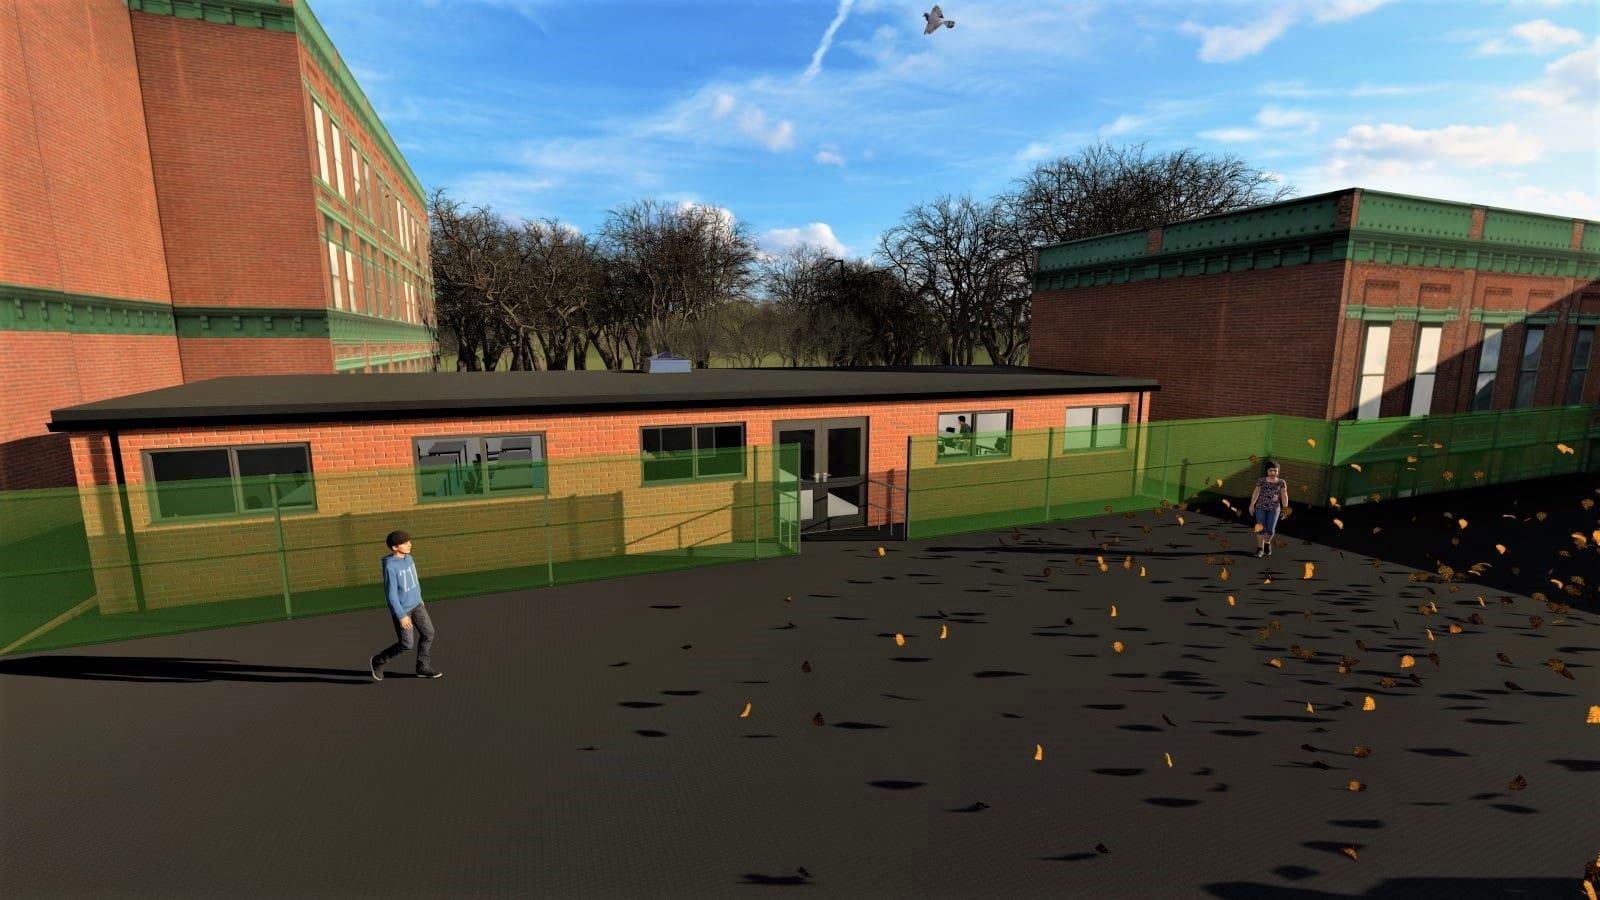 Wollaston School Modular Building & Landscape Revit 3D Visual